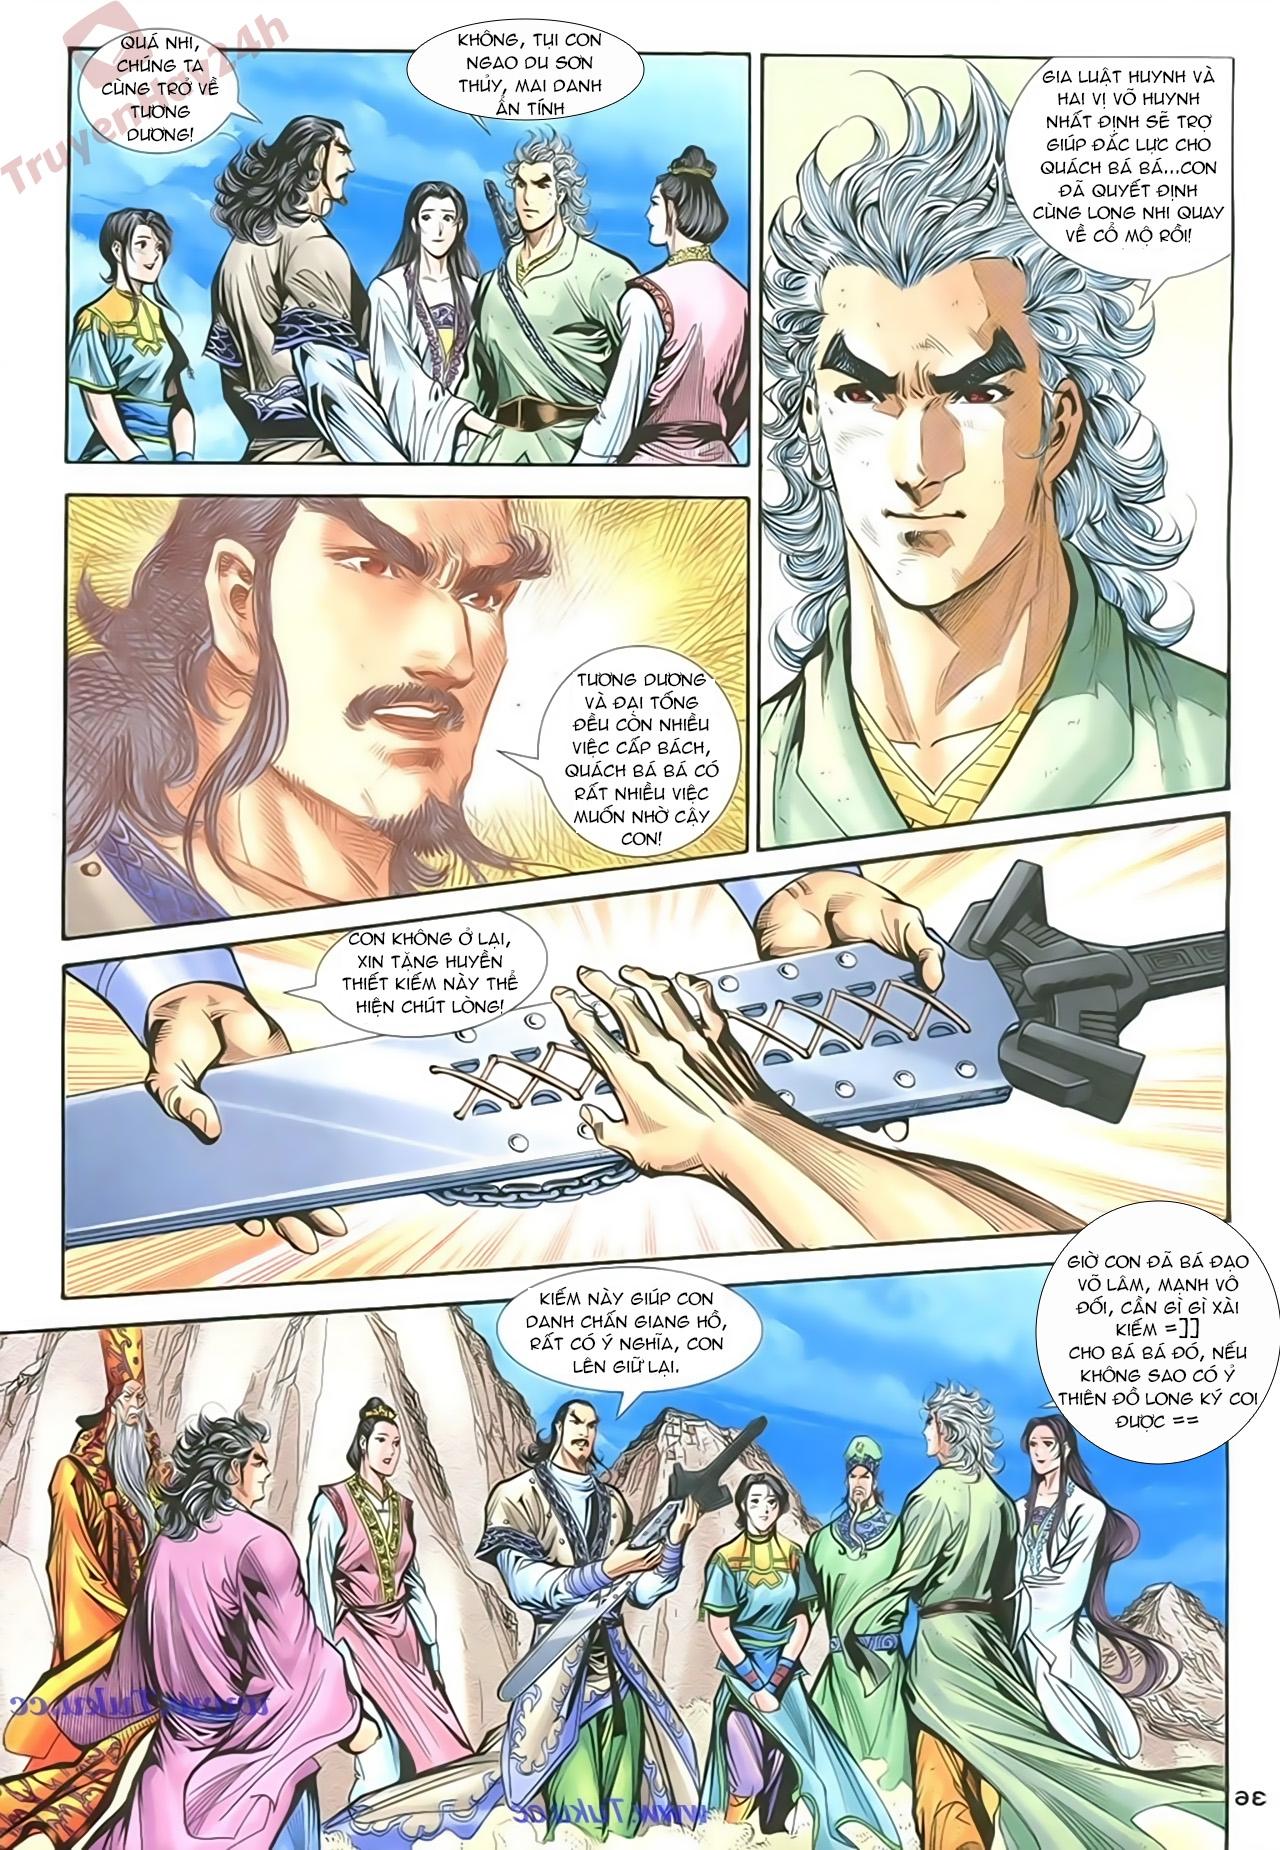 Thần Điêu Hiệp Lữ chap 86 – End Trang 35 - Mangak.info